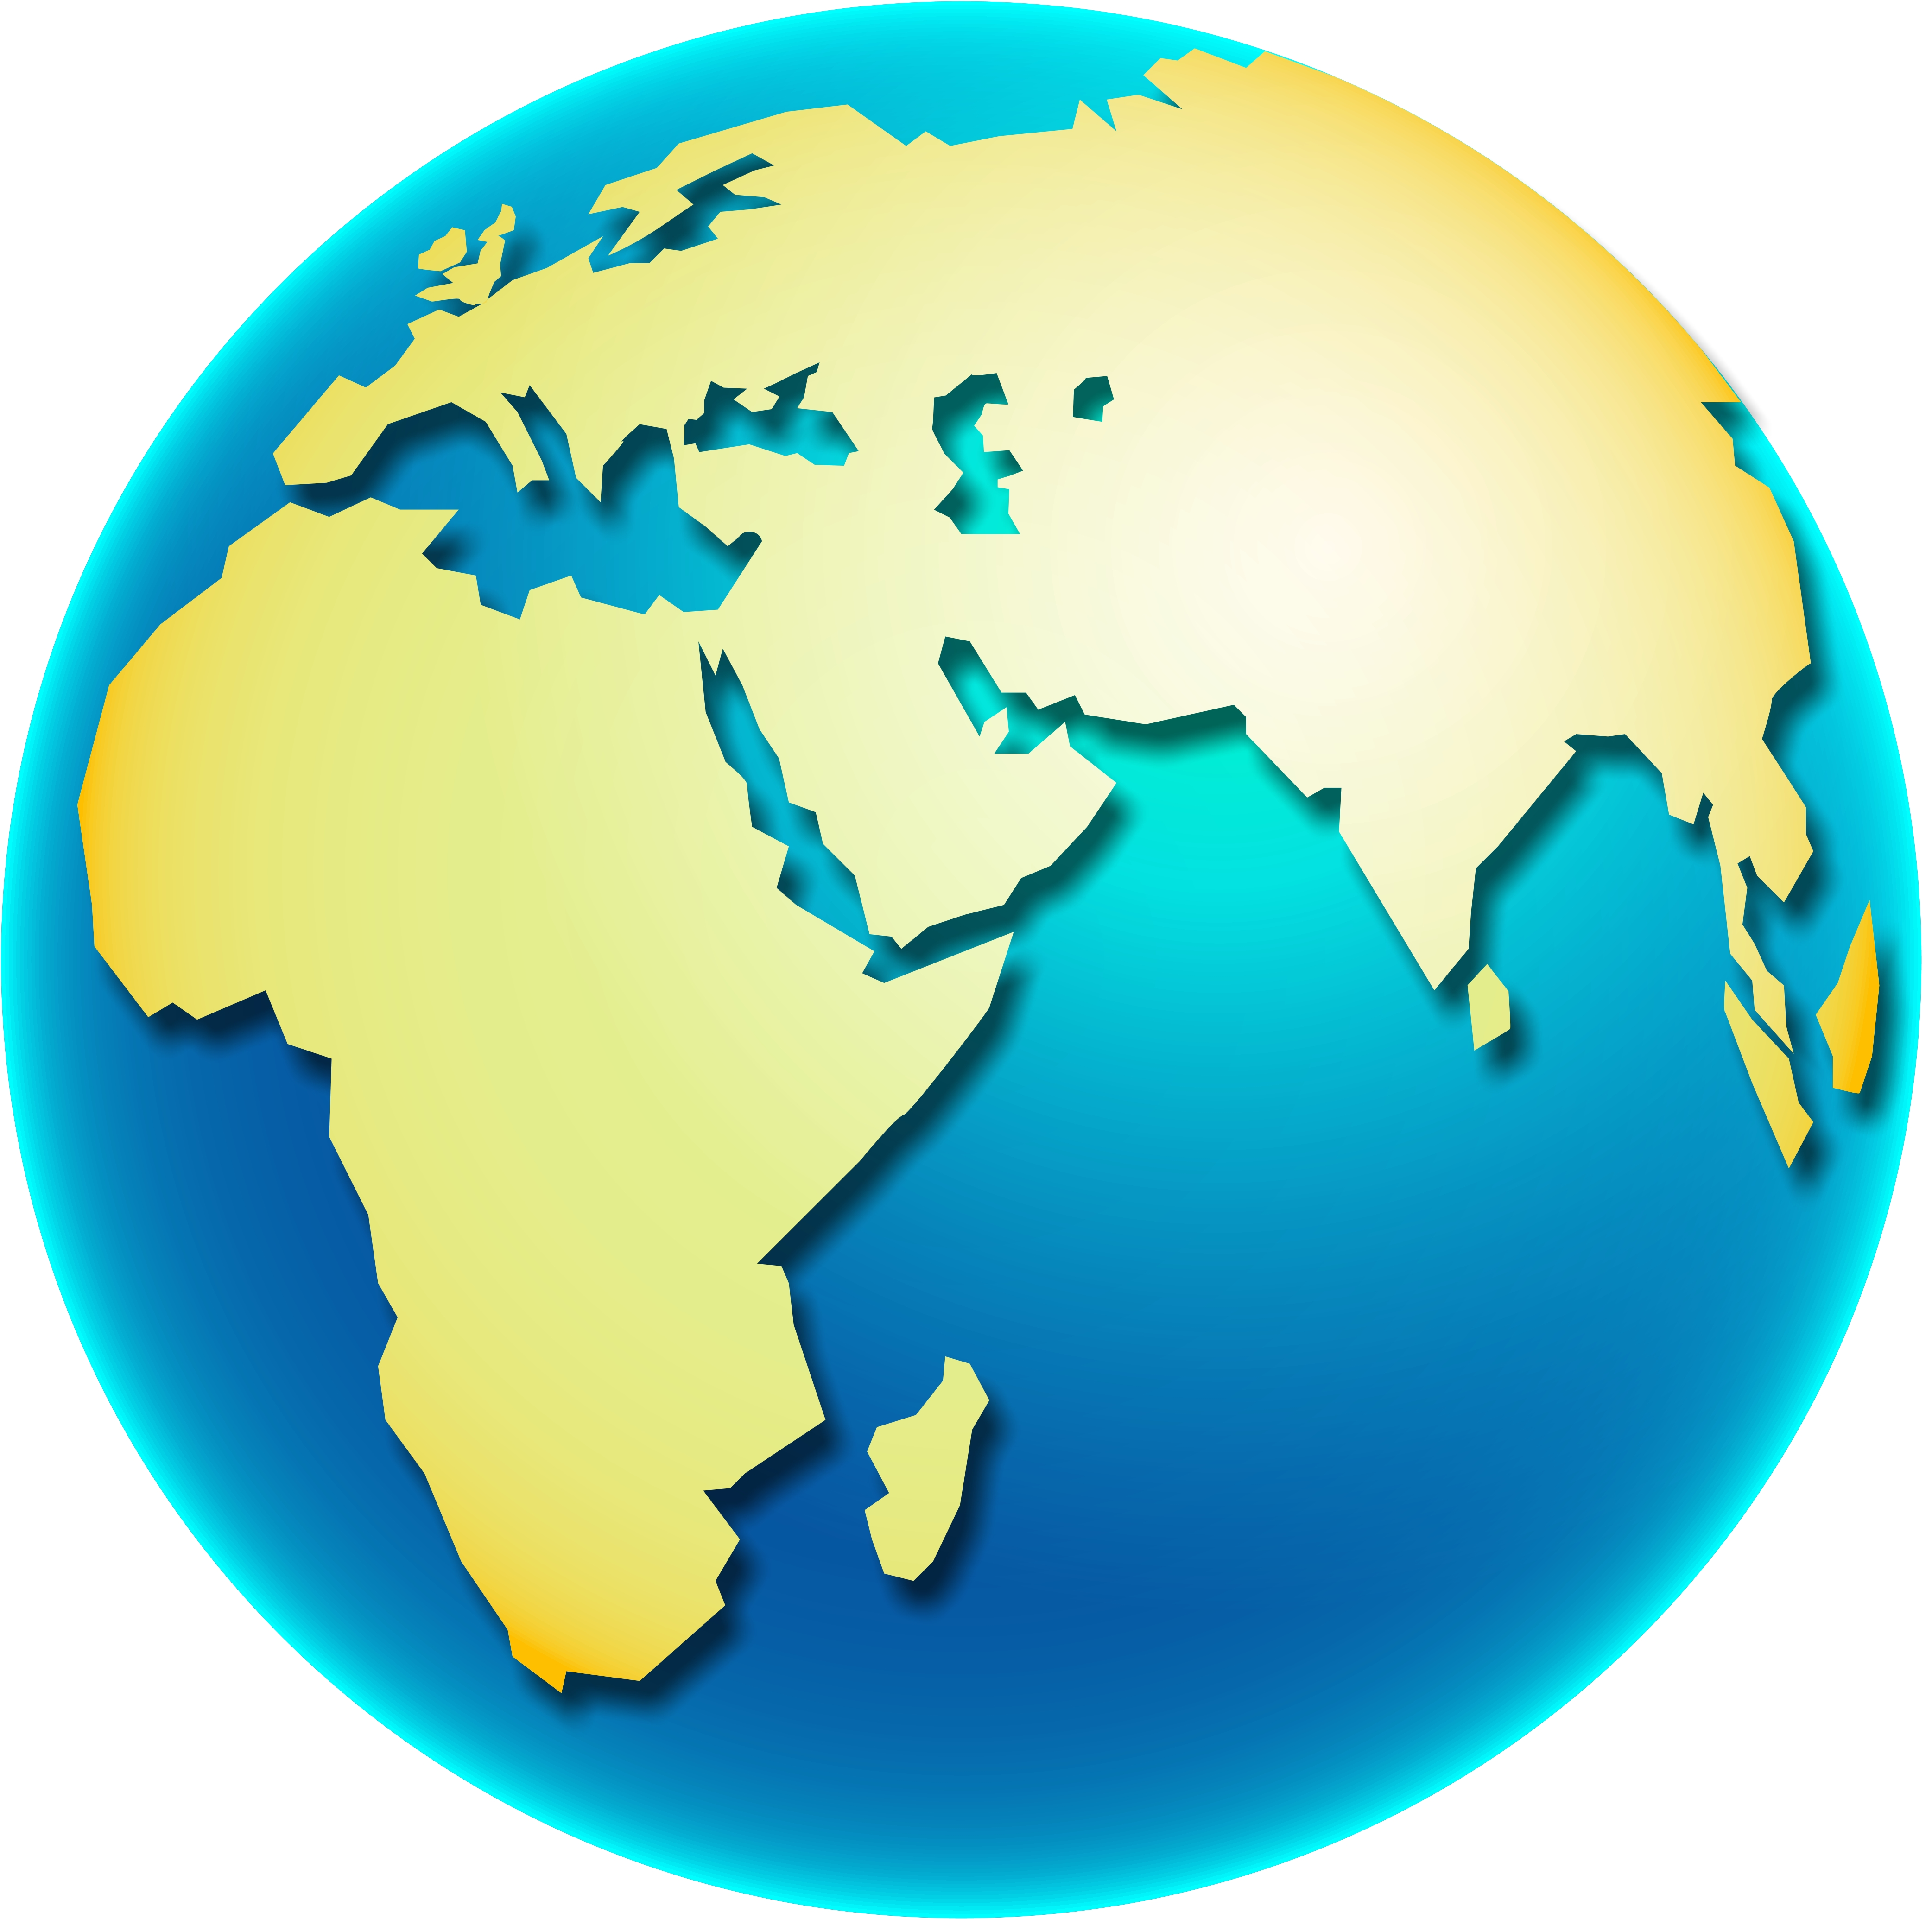 Earth globe clip art